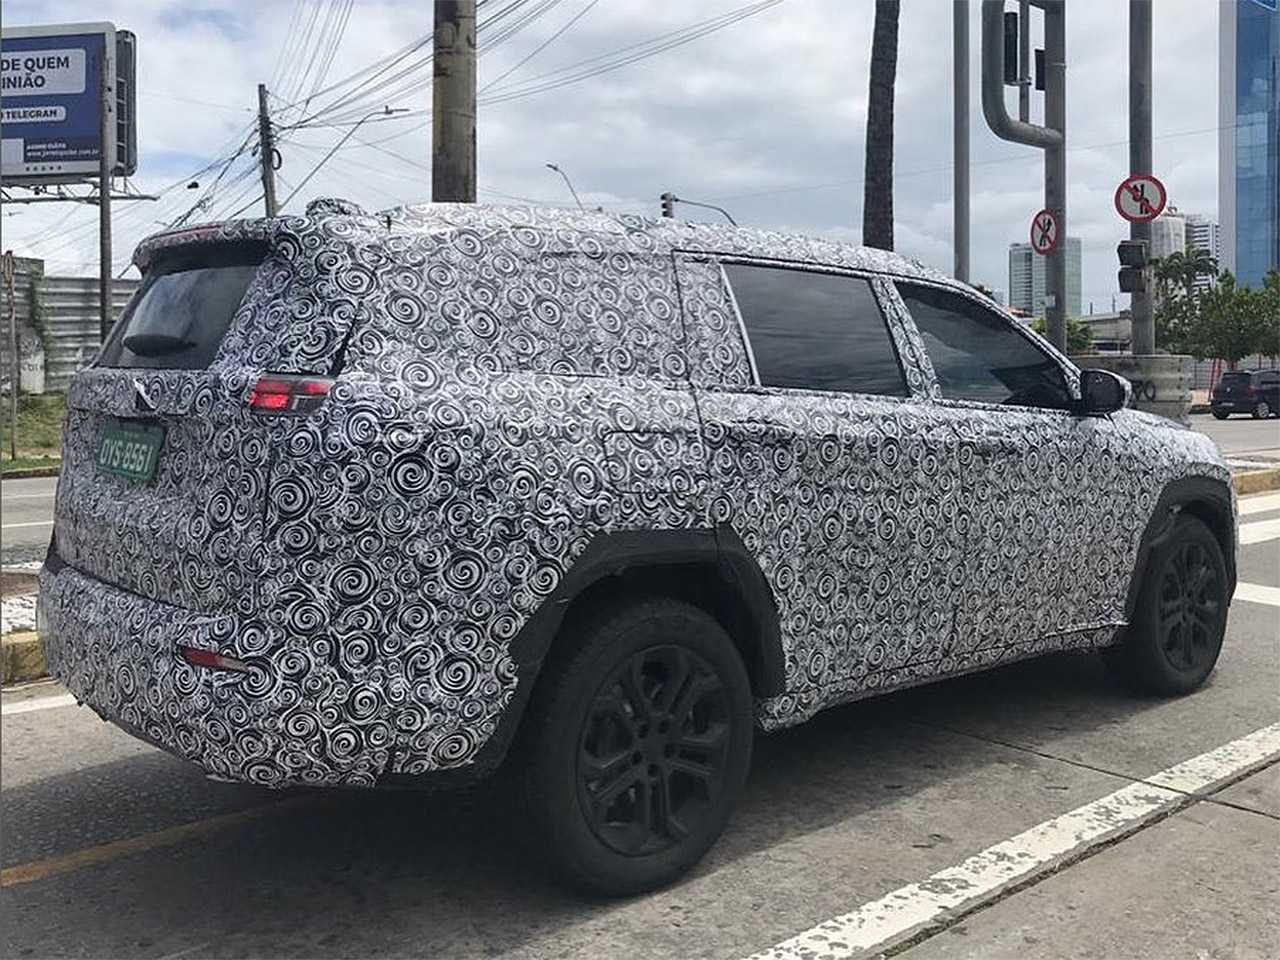 Flagra do inédito SUV 7 lugares da Jeep